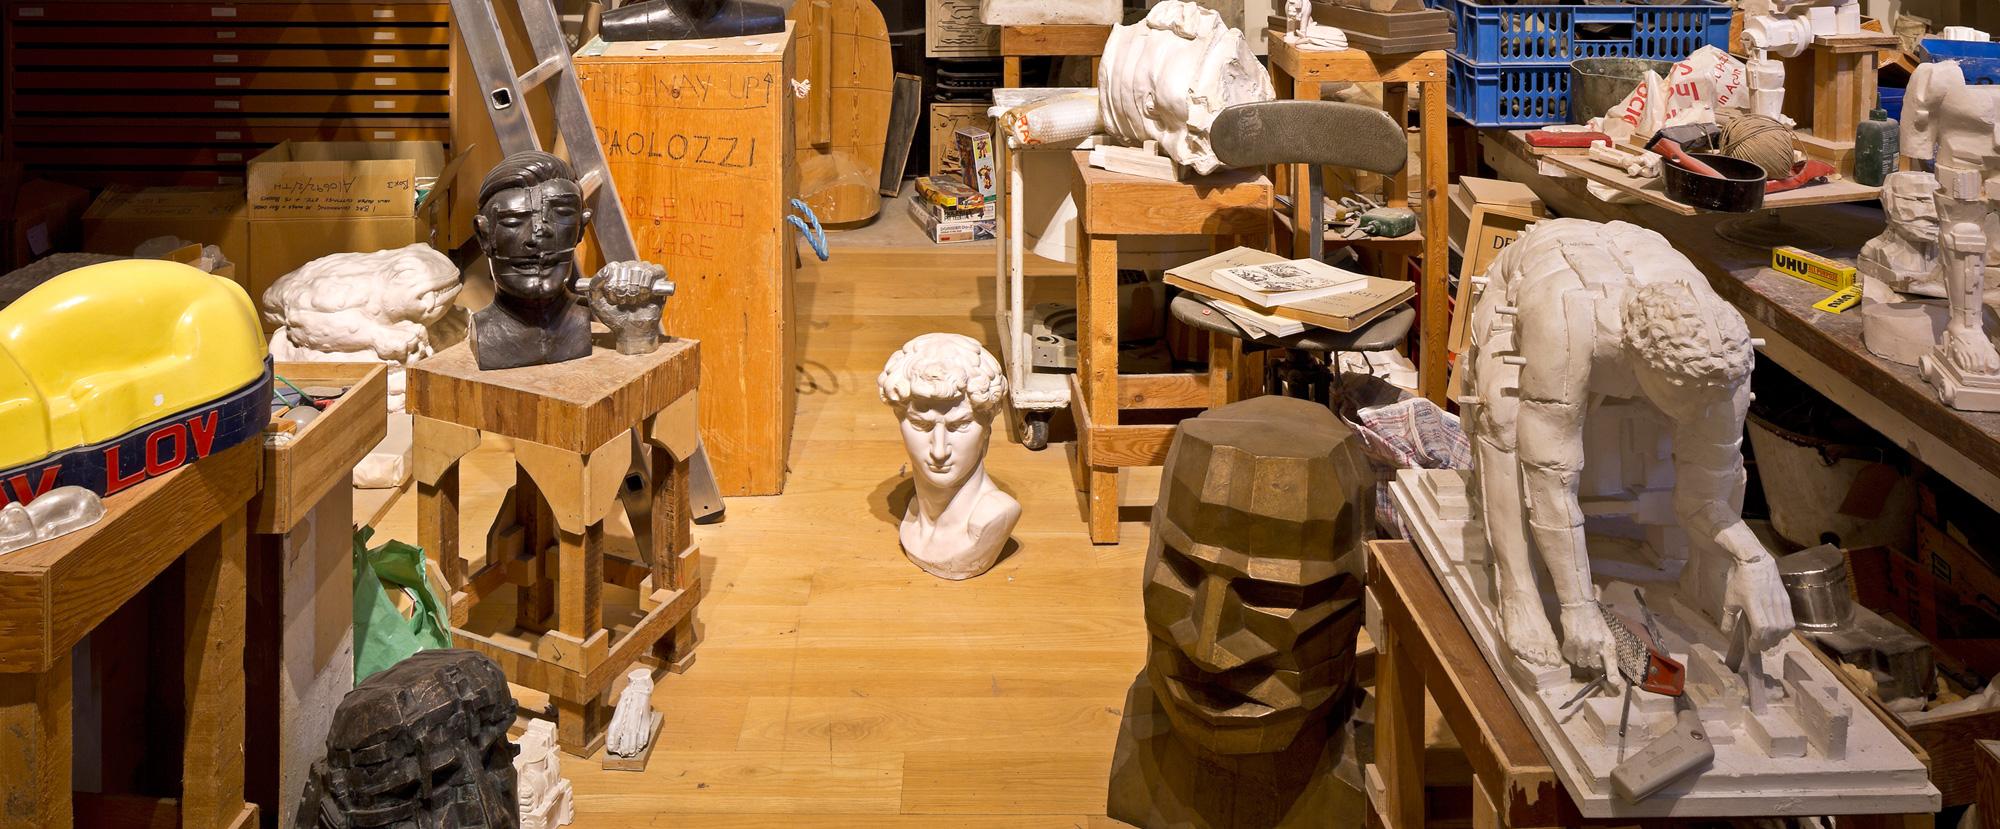 Paolozzi Studio | National Galleries of Scotland